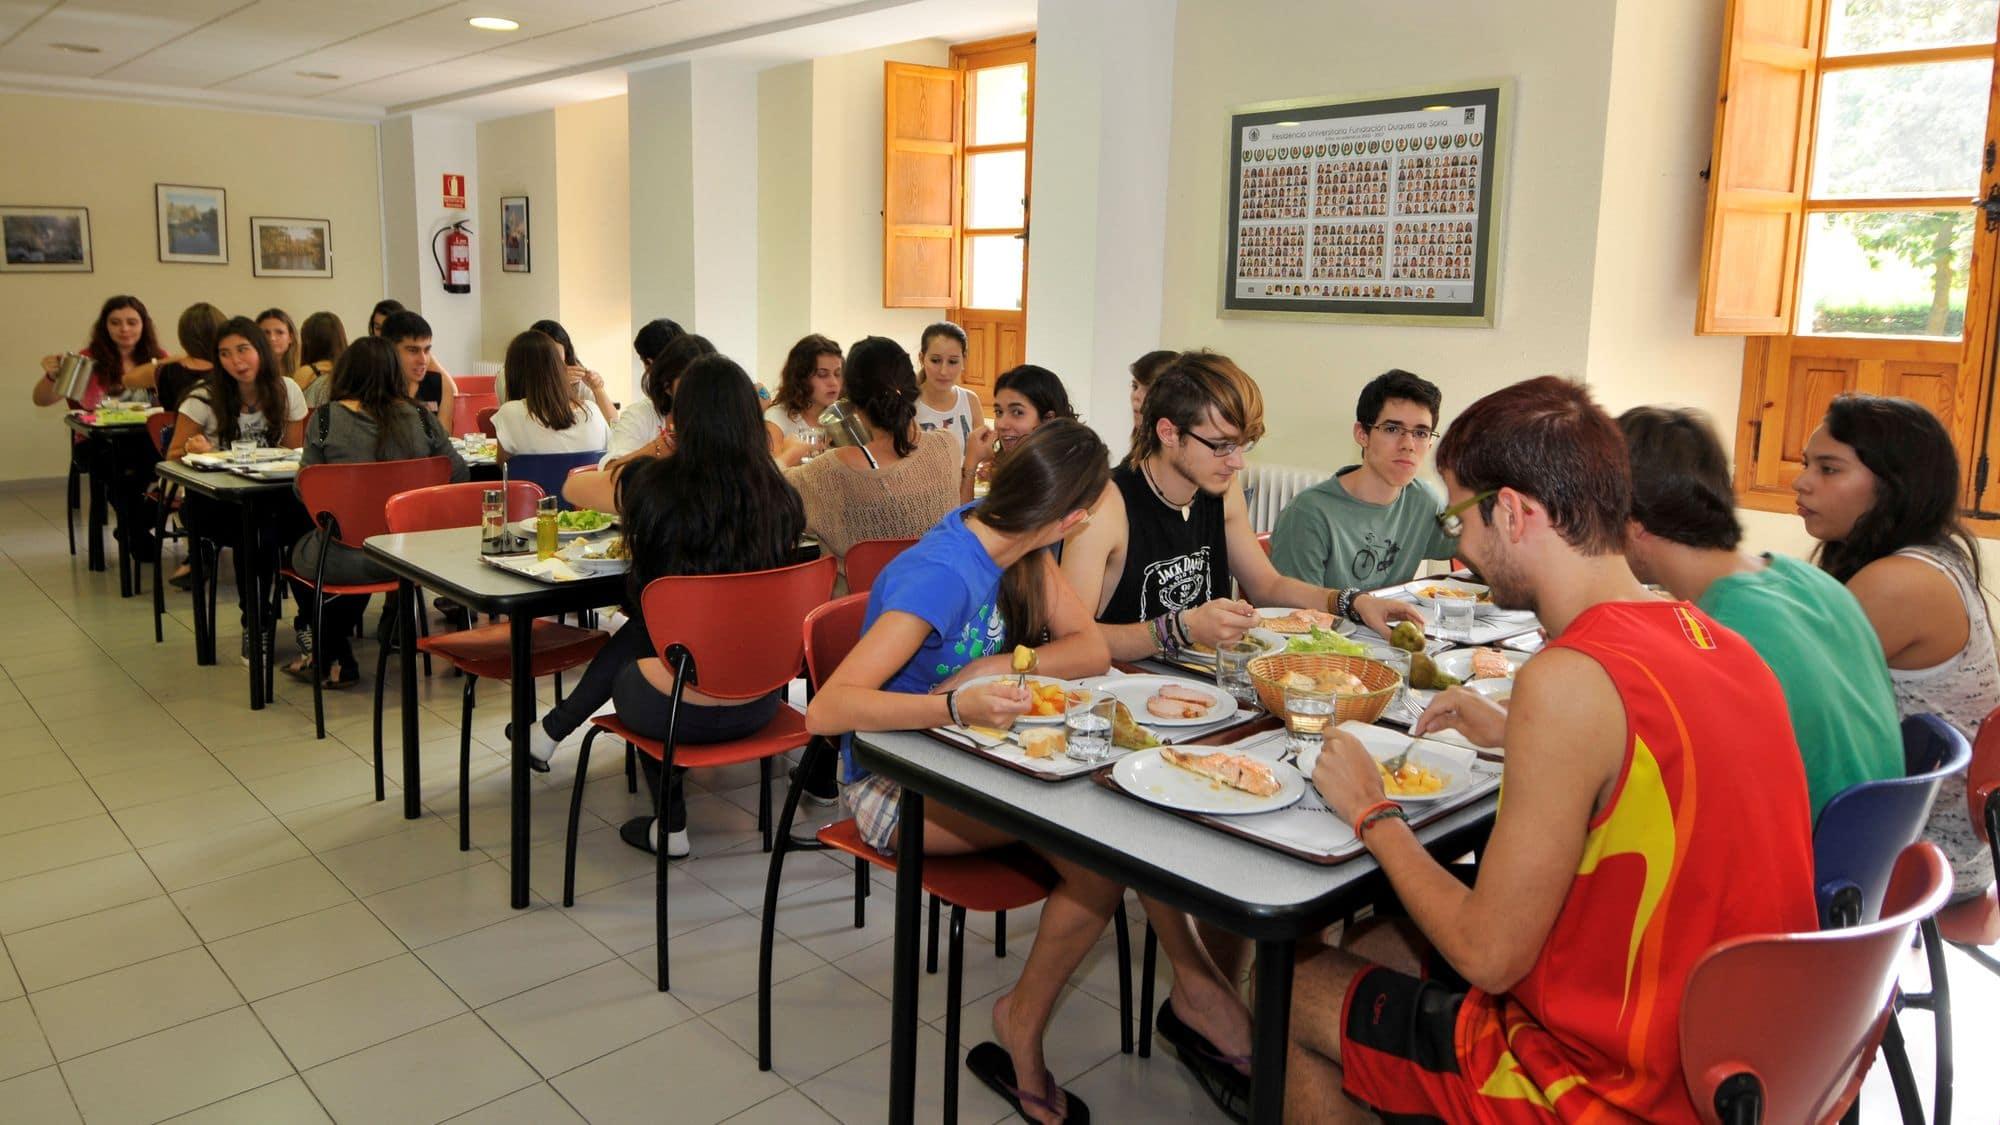 https://funge.uva.es/wp-content/uploads/2020/12/Comedor-Residencia-Duques-de-Soria-Universidad-de-Valladolid1.jpg